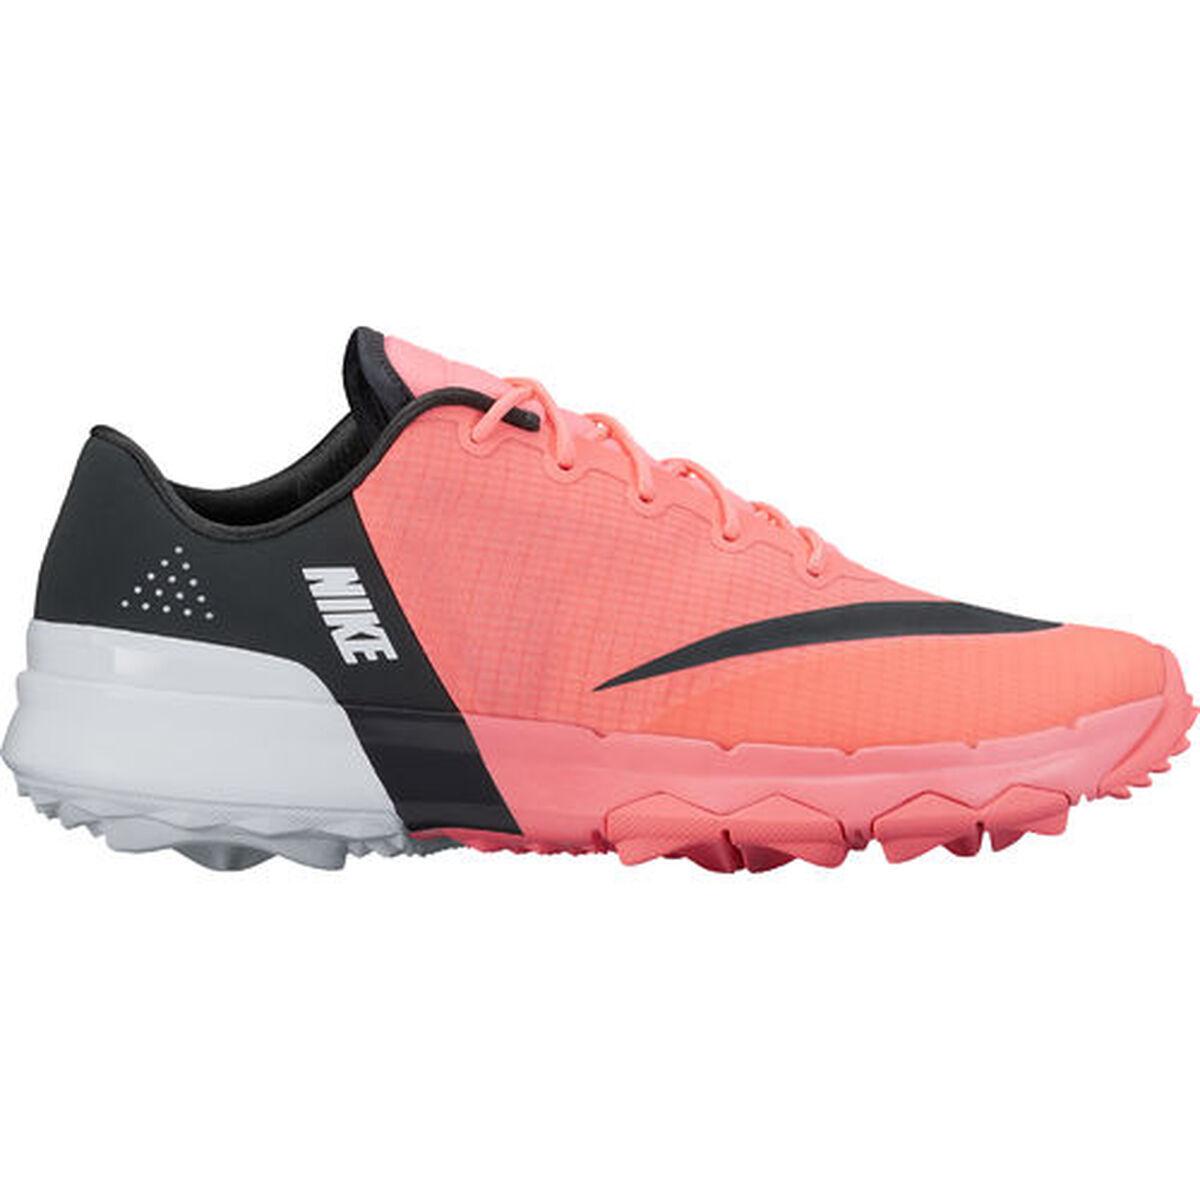 003f30475ca9 Nike FI Flex Women s Golf Shoe - Orange White